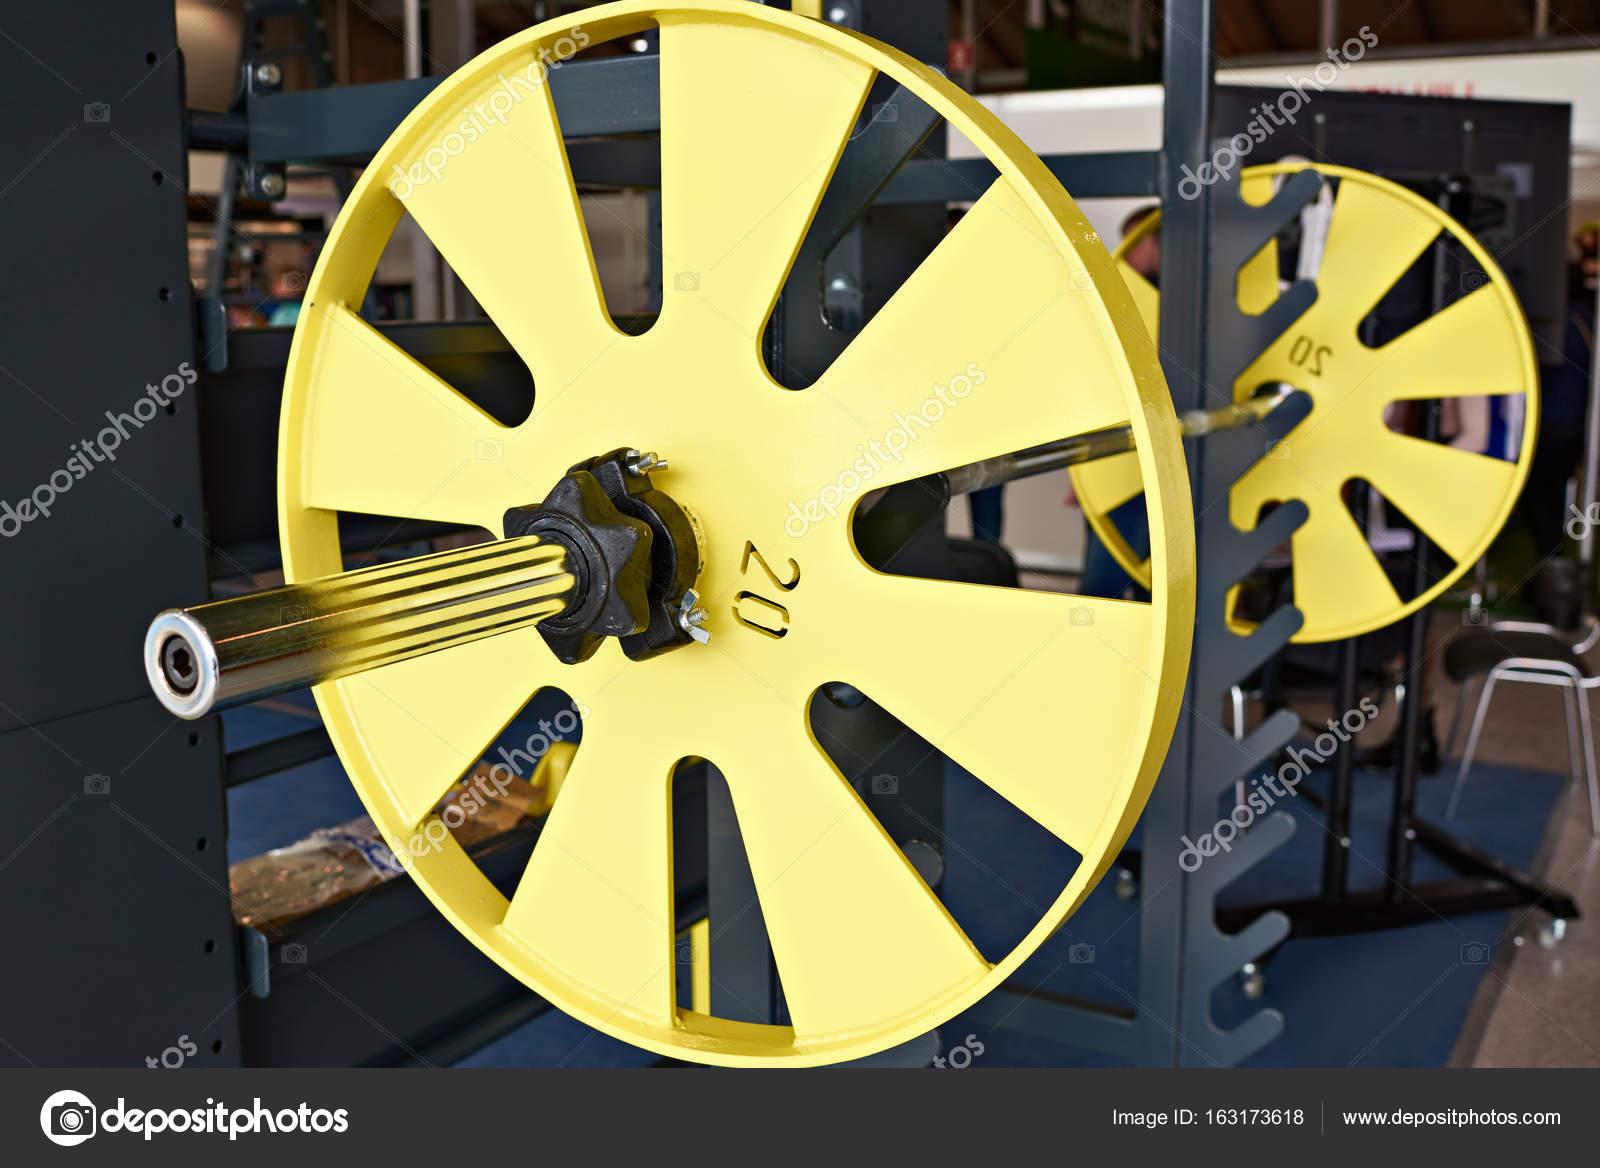 Langhantel auf Gestell in Sporthalle — Stockfoto © ryzhov #163173618